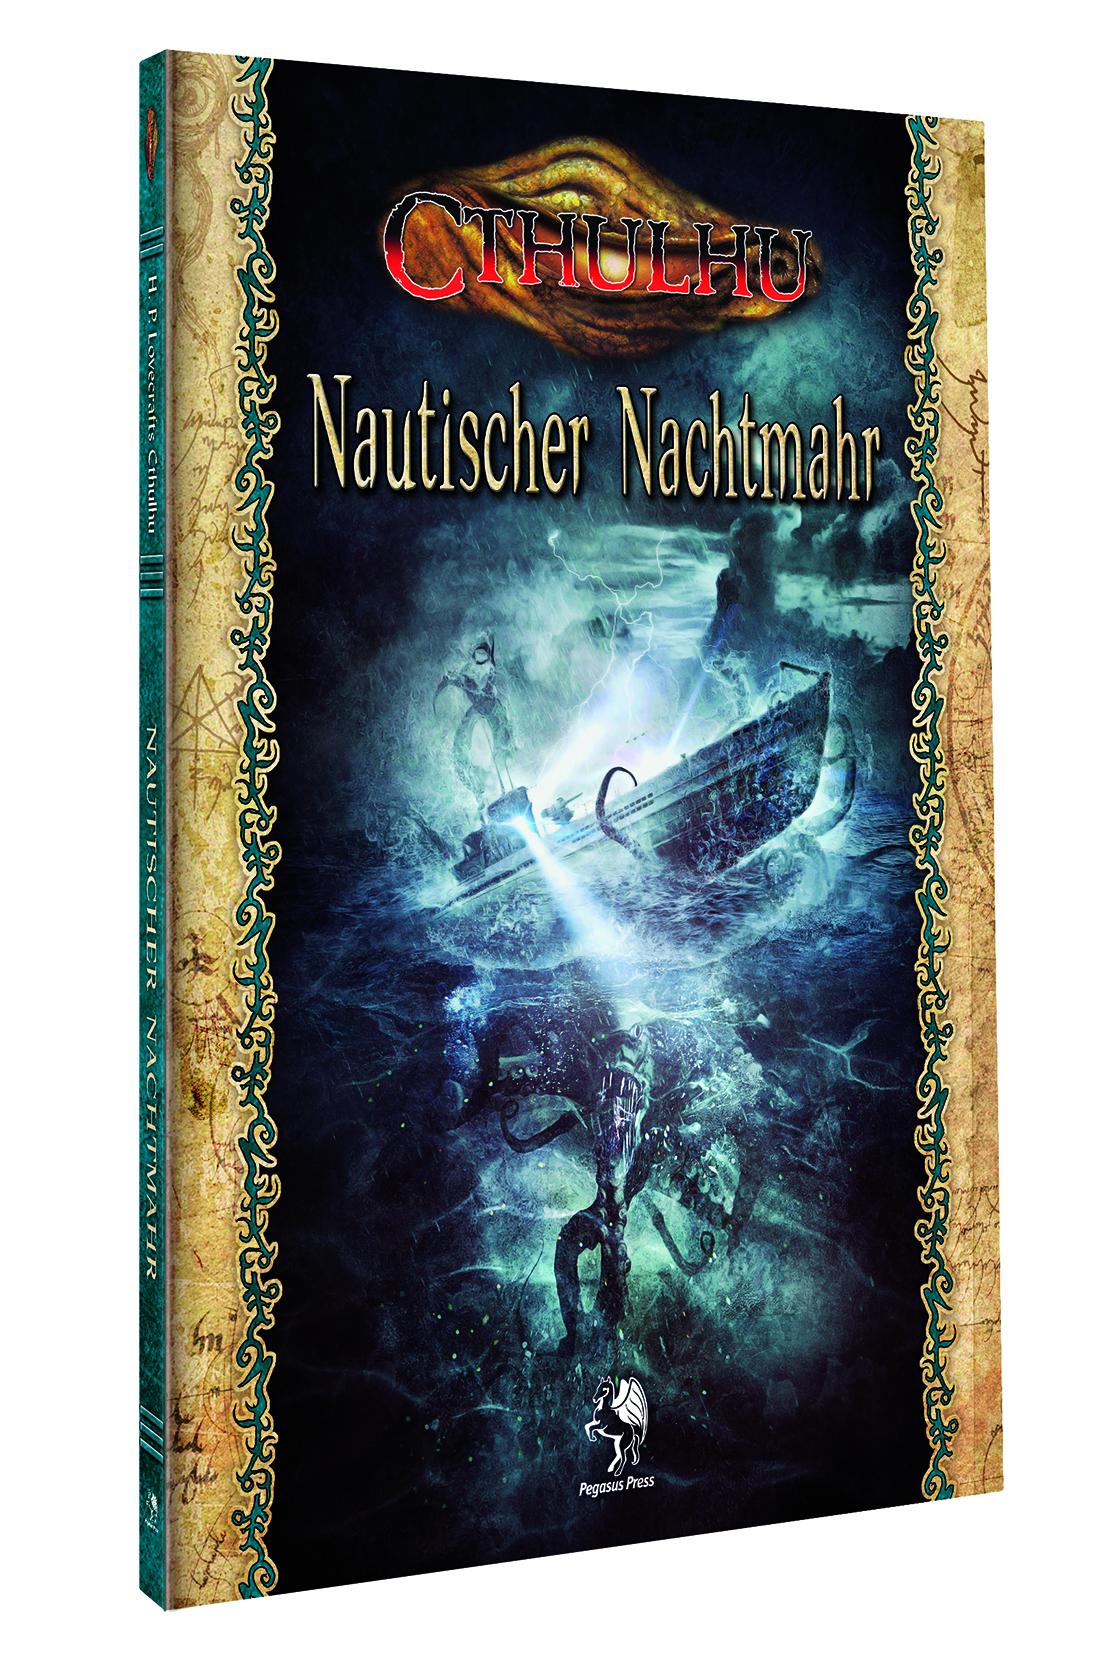 Cthulhu: Nautischer Nachtmahr (Softcover)